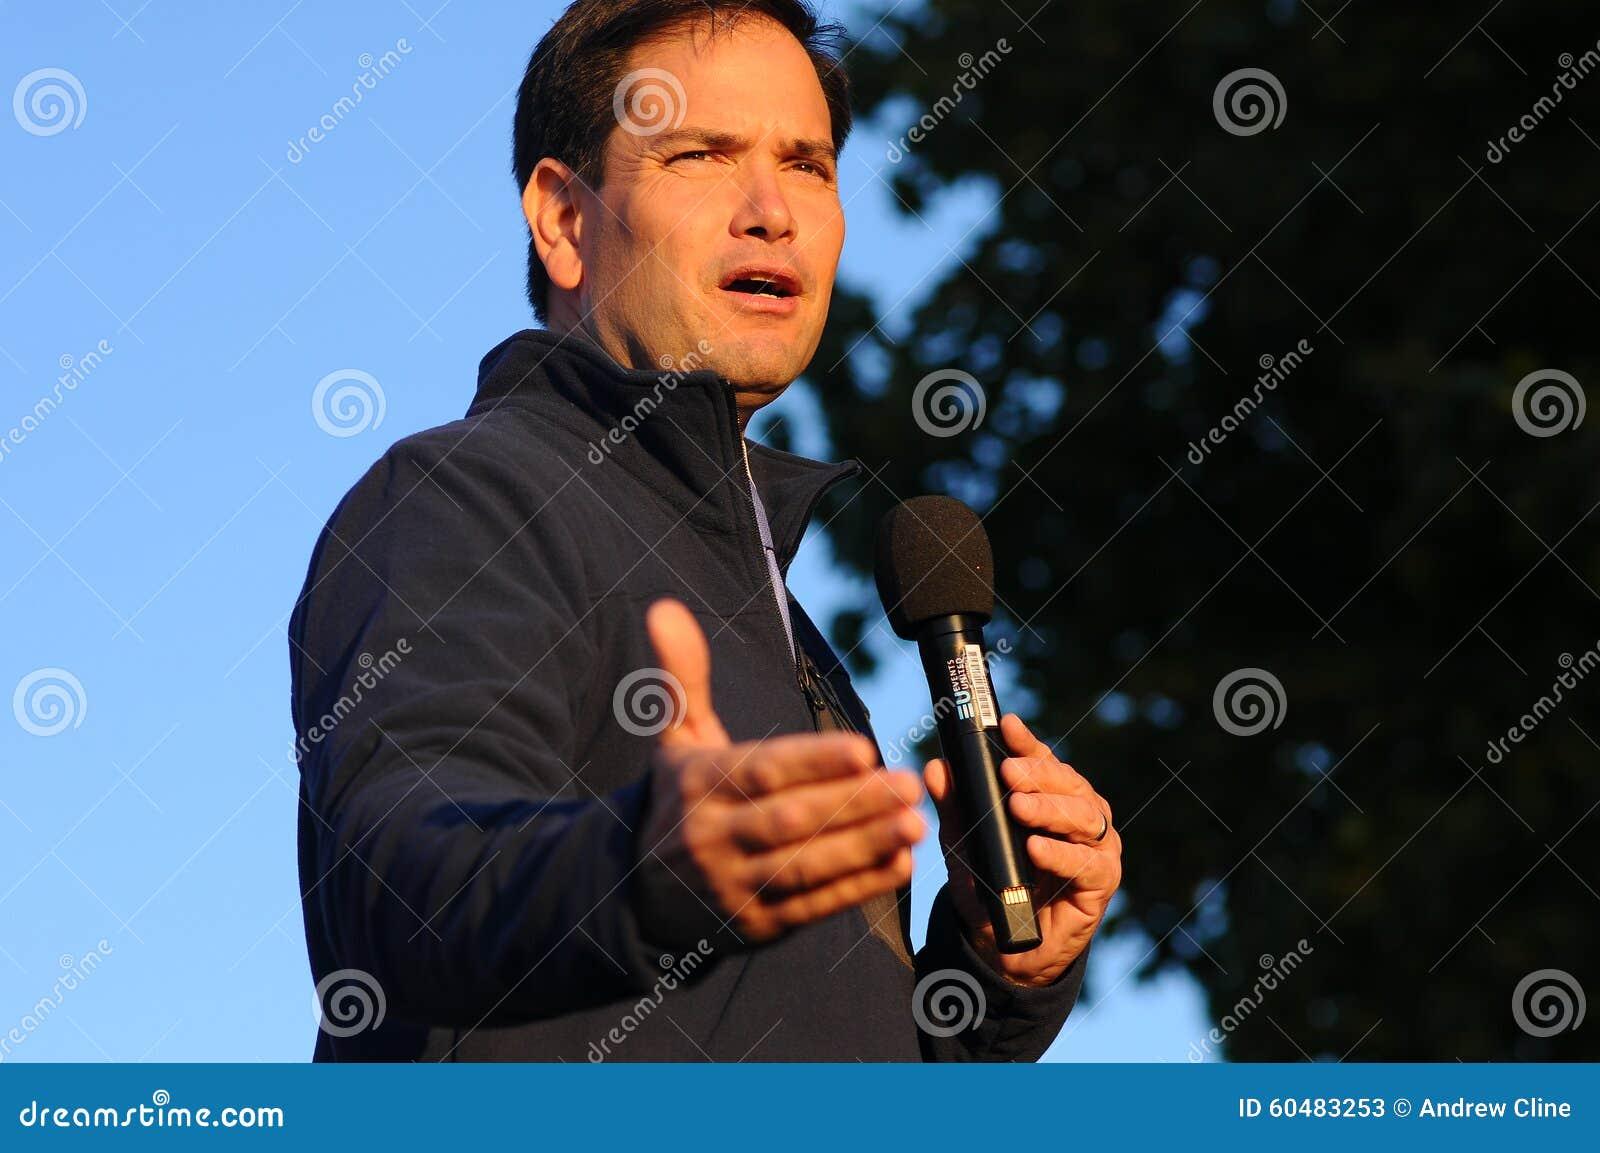 U S Senator Marco Rubio, Republikeins van Florida, spreekt in Bedford, New Hampshire op 6 Oktober, 2015